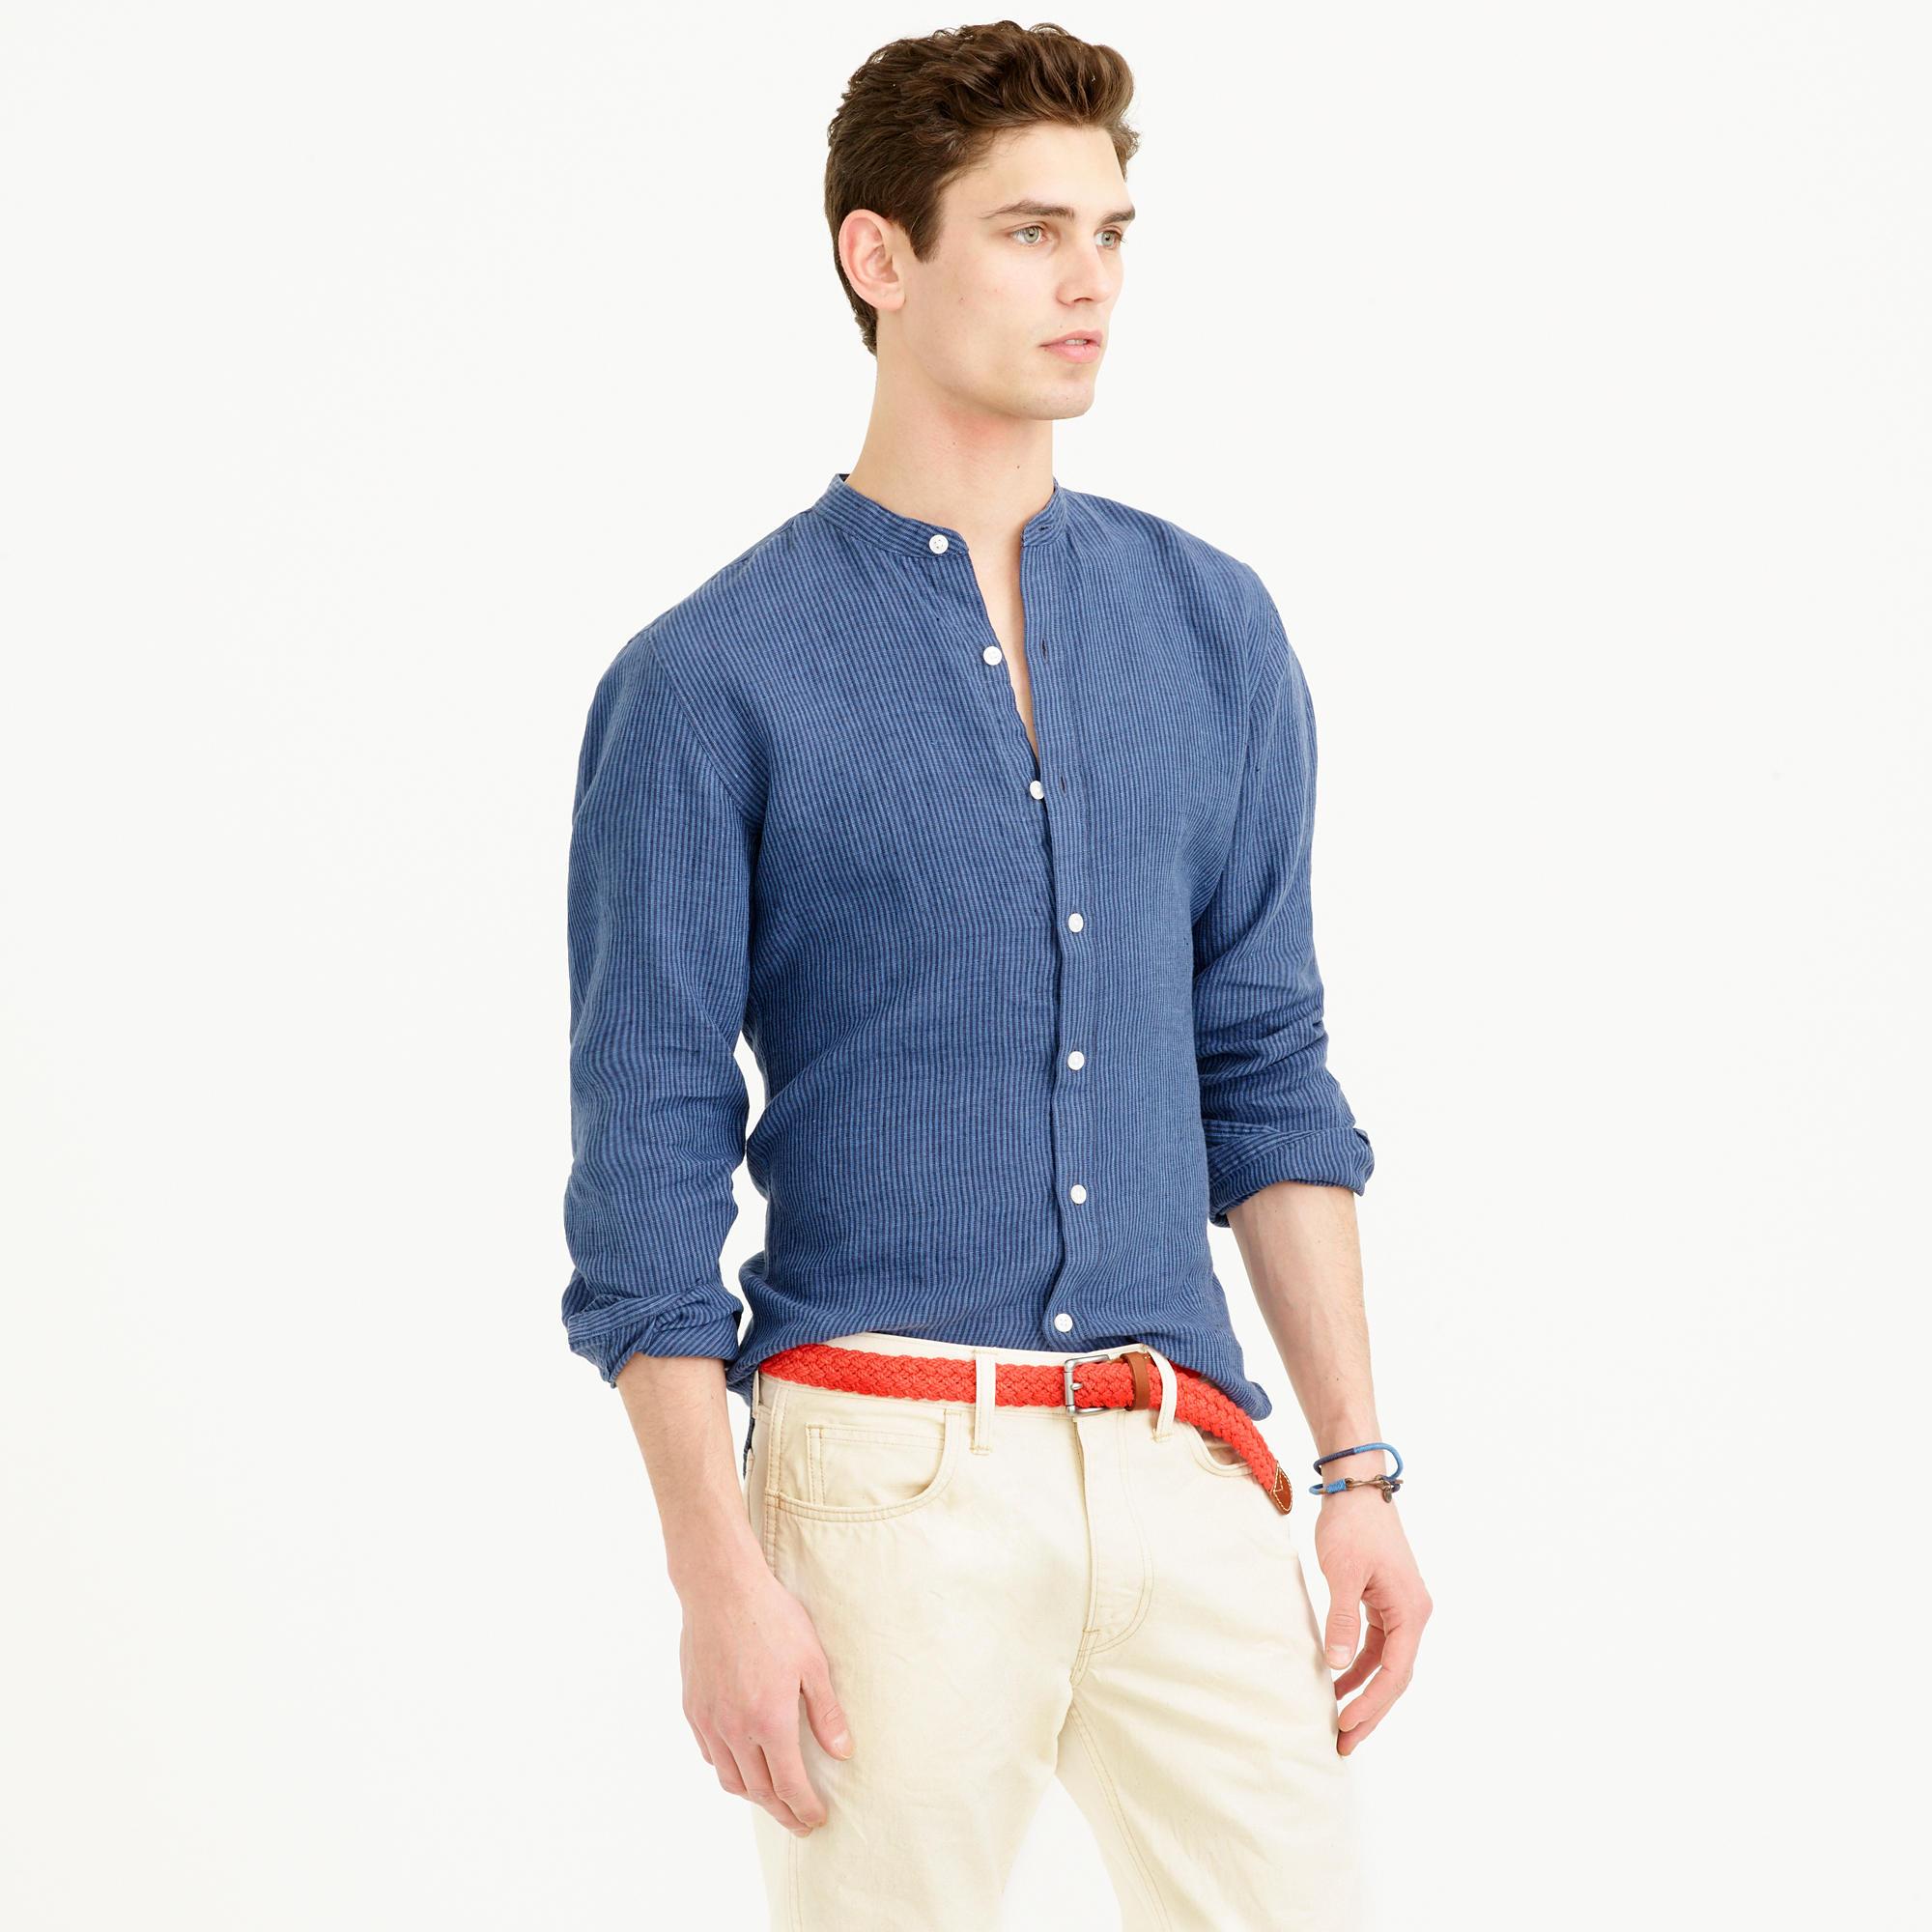 Linen Band Collar Shirt In Coastline Navy Stripe In